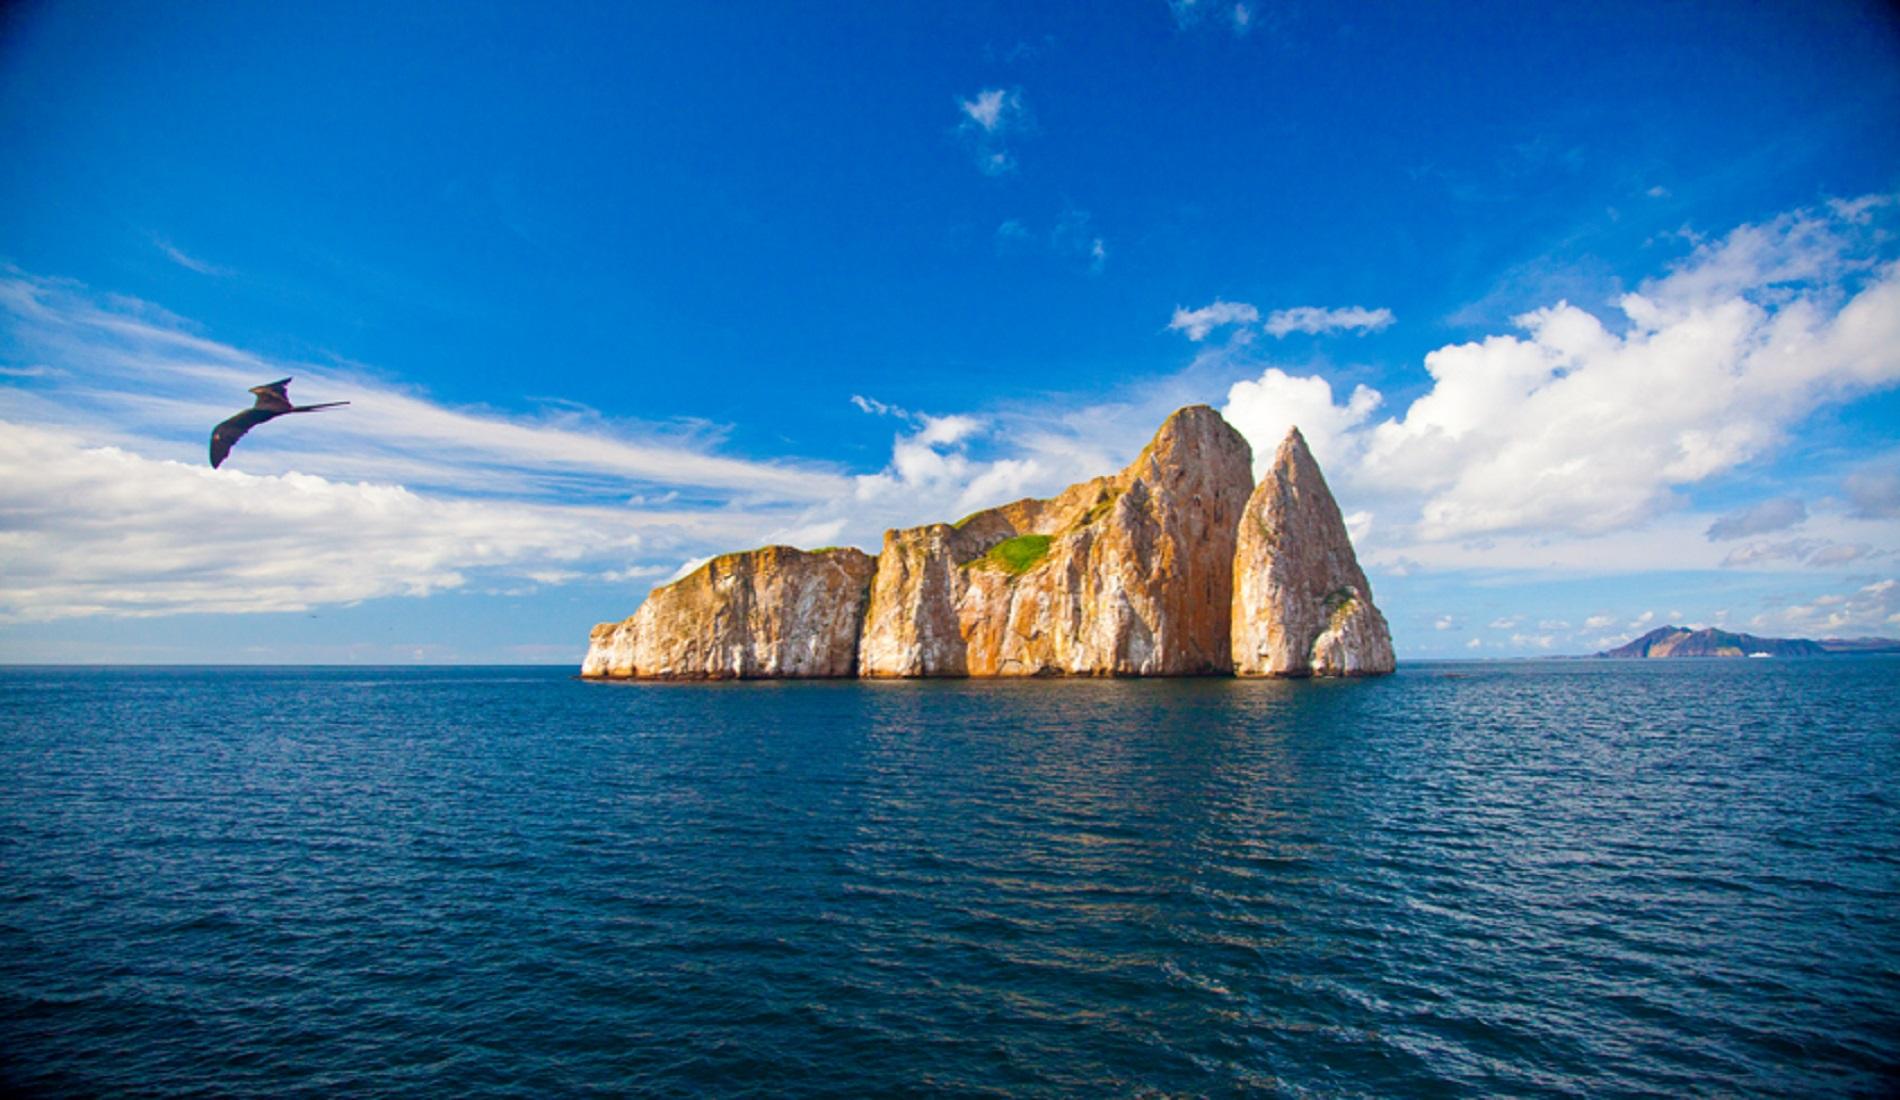 Kicker Rock duikreis Galapagos eilanden